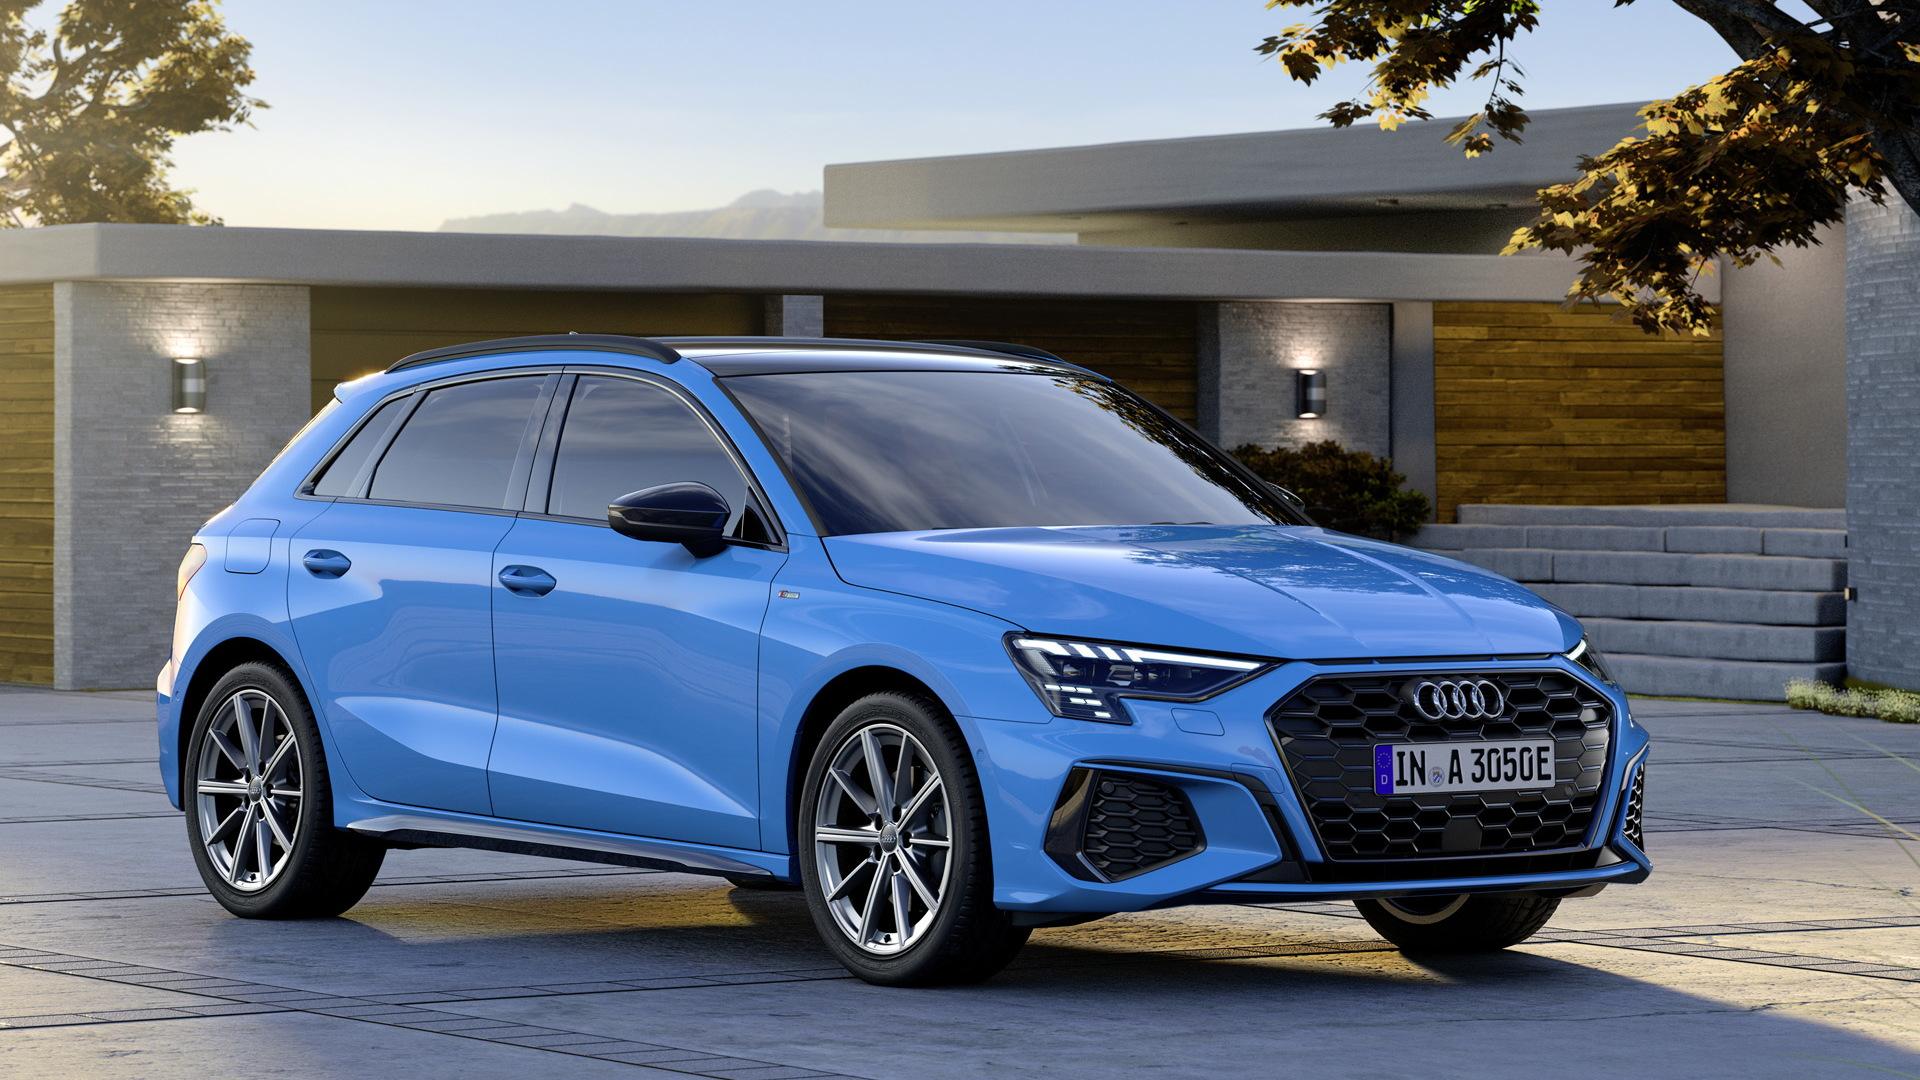 2022 Audi A3 Sportback 40 TFSI e